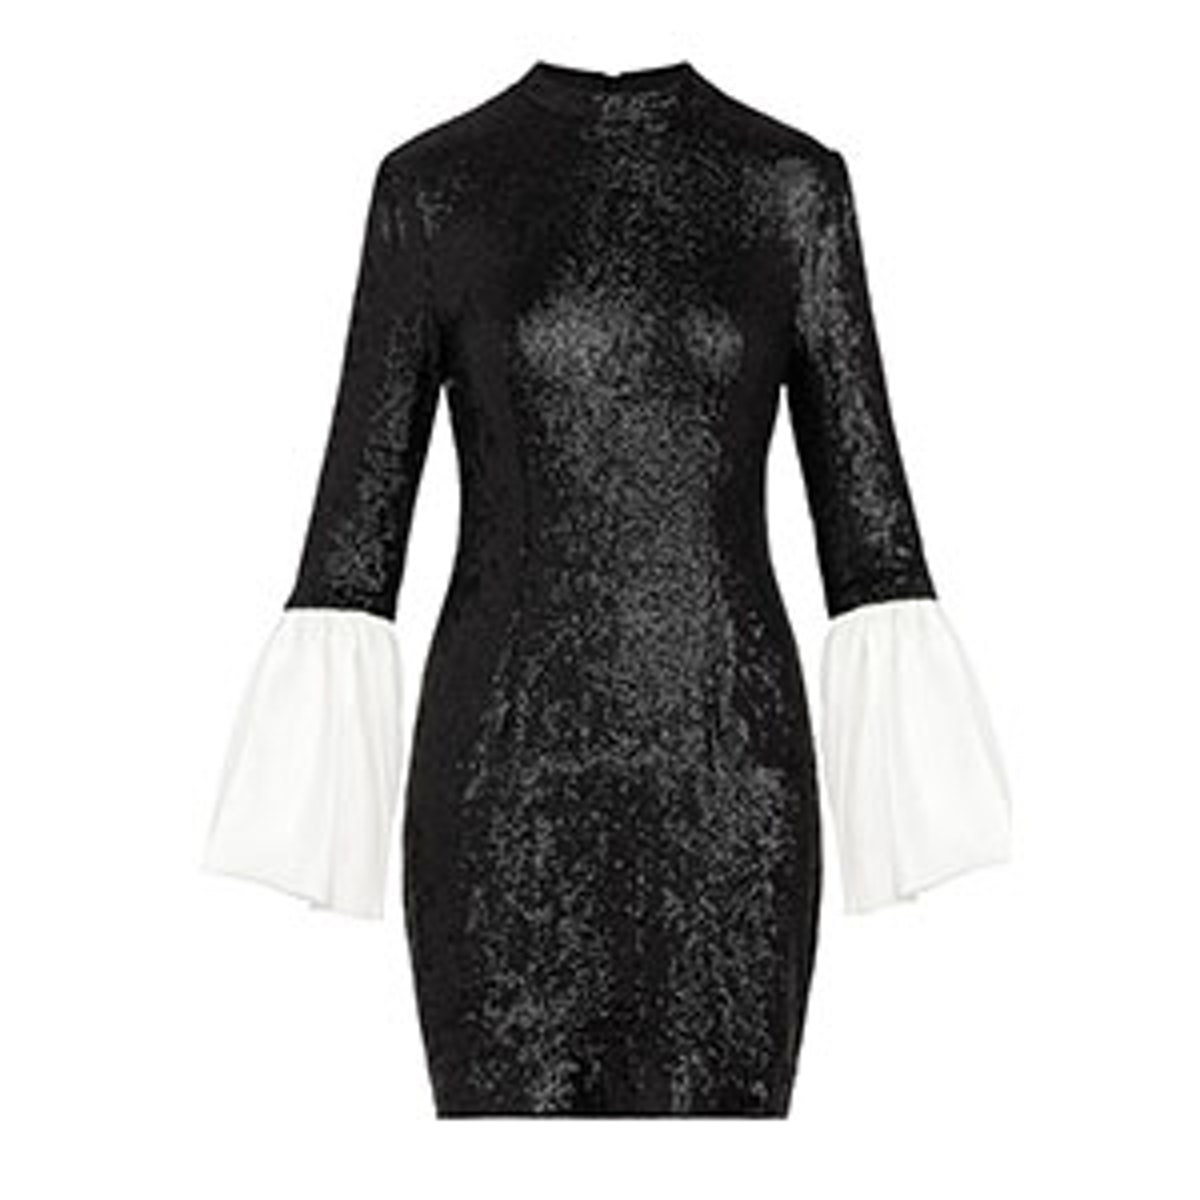 Wes Bell Sleeve Fluid Sequin Dress